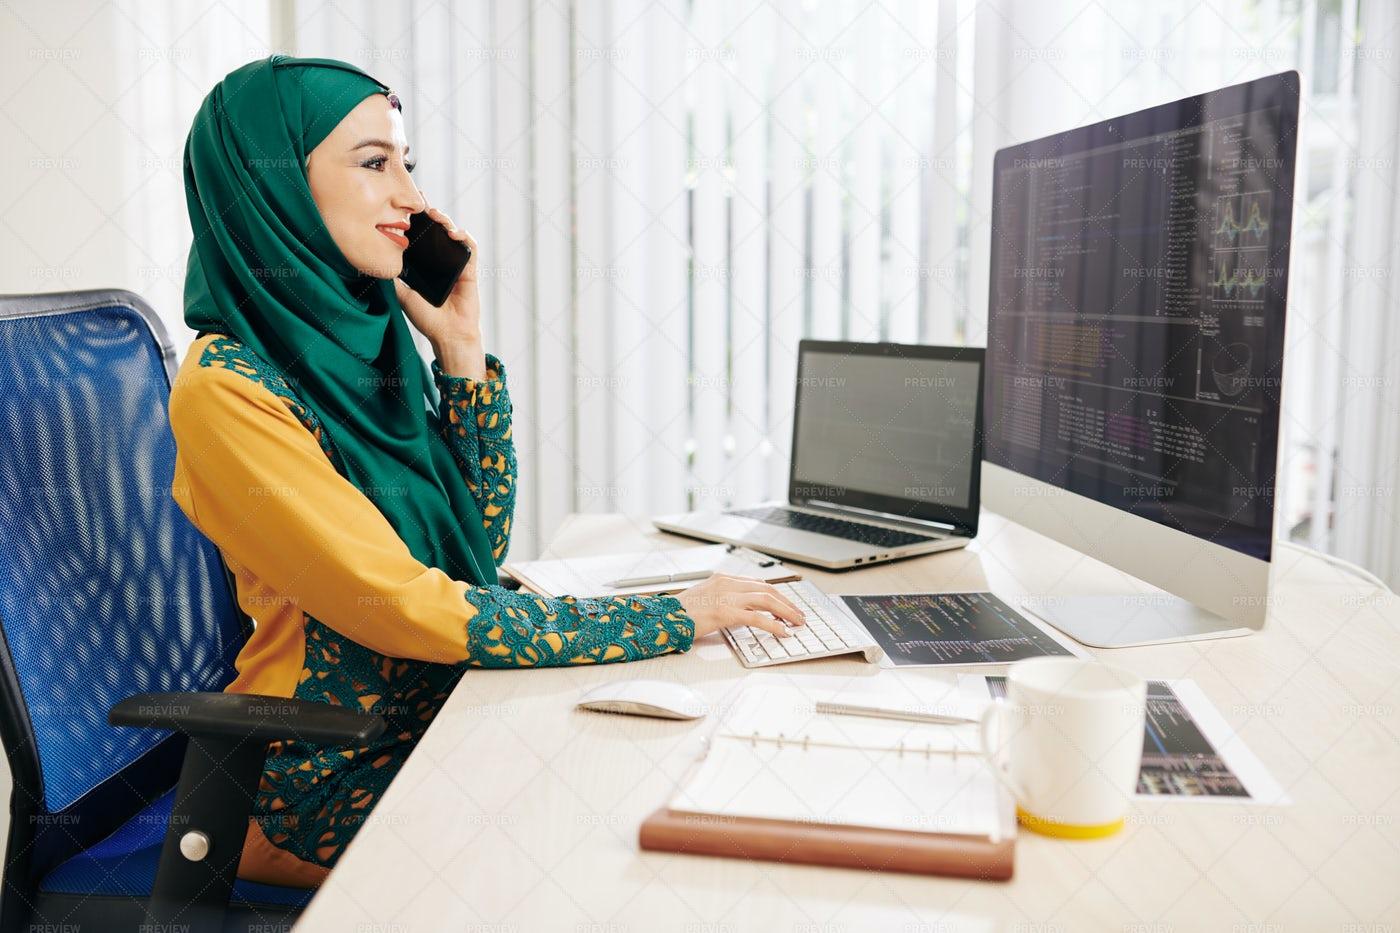 BusinessWoman On The Phone: Stock Photos